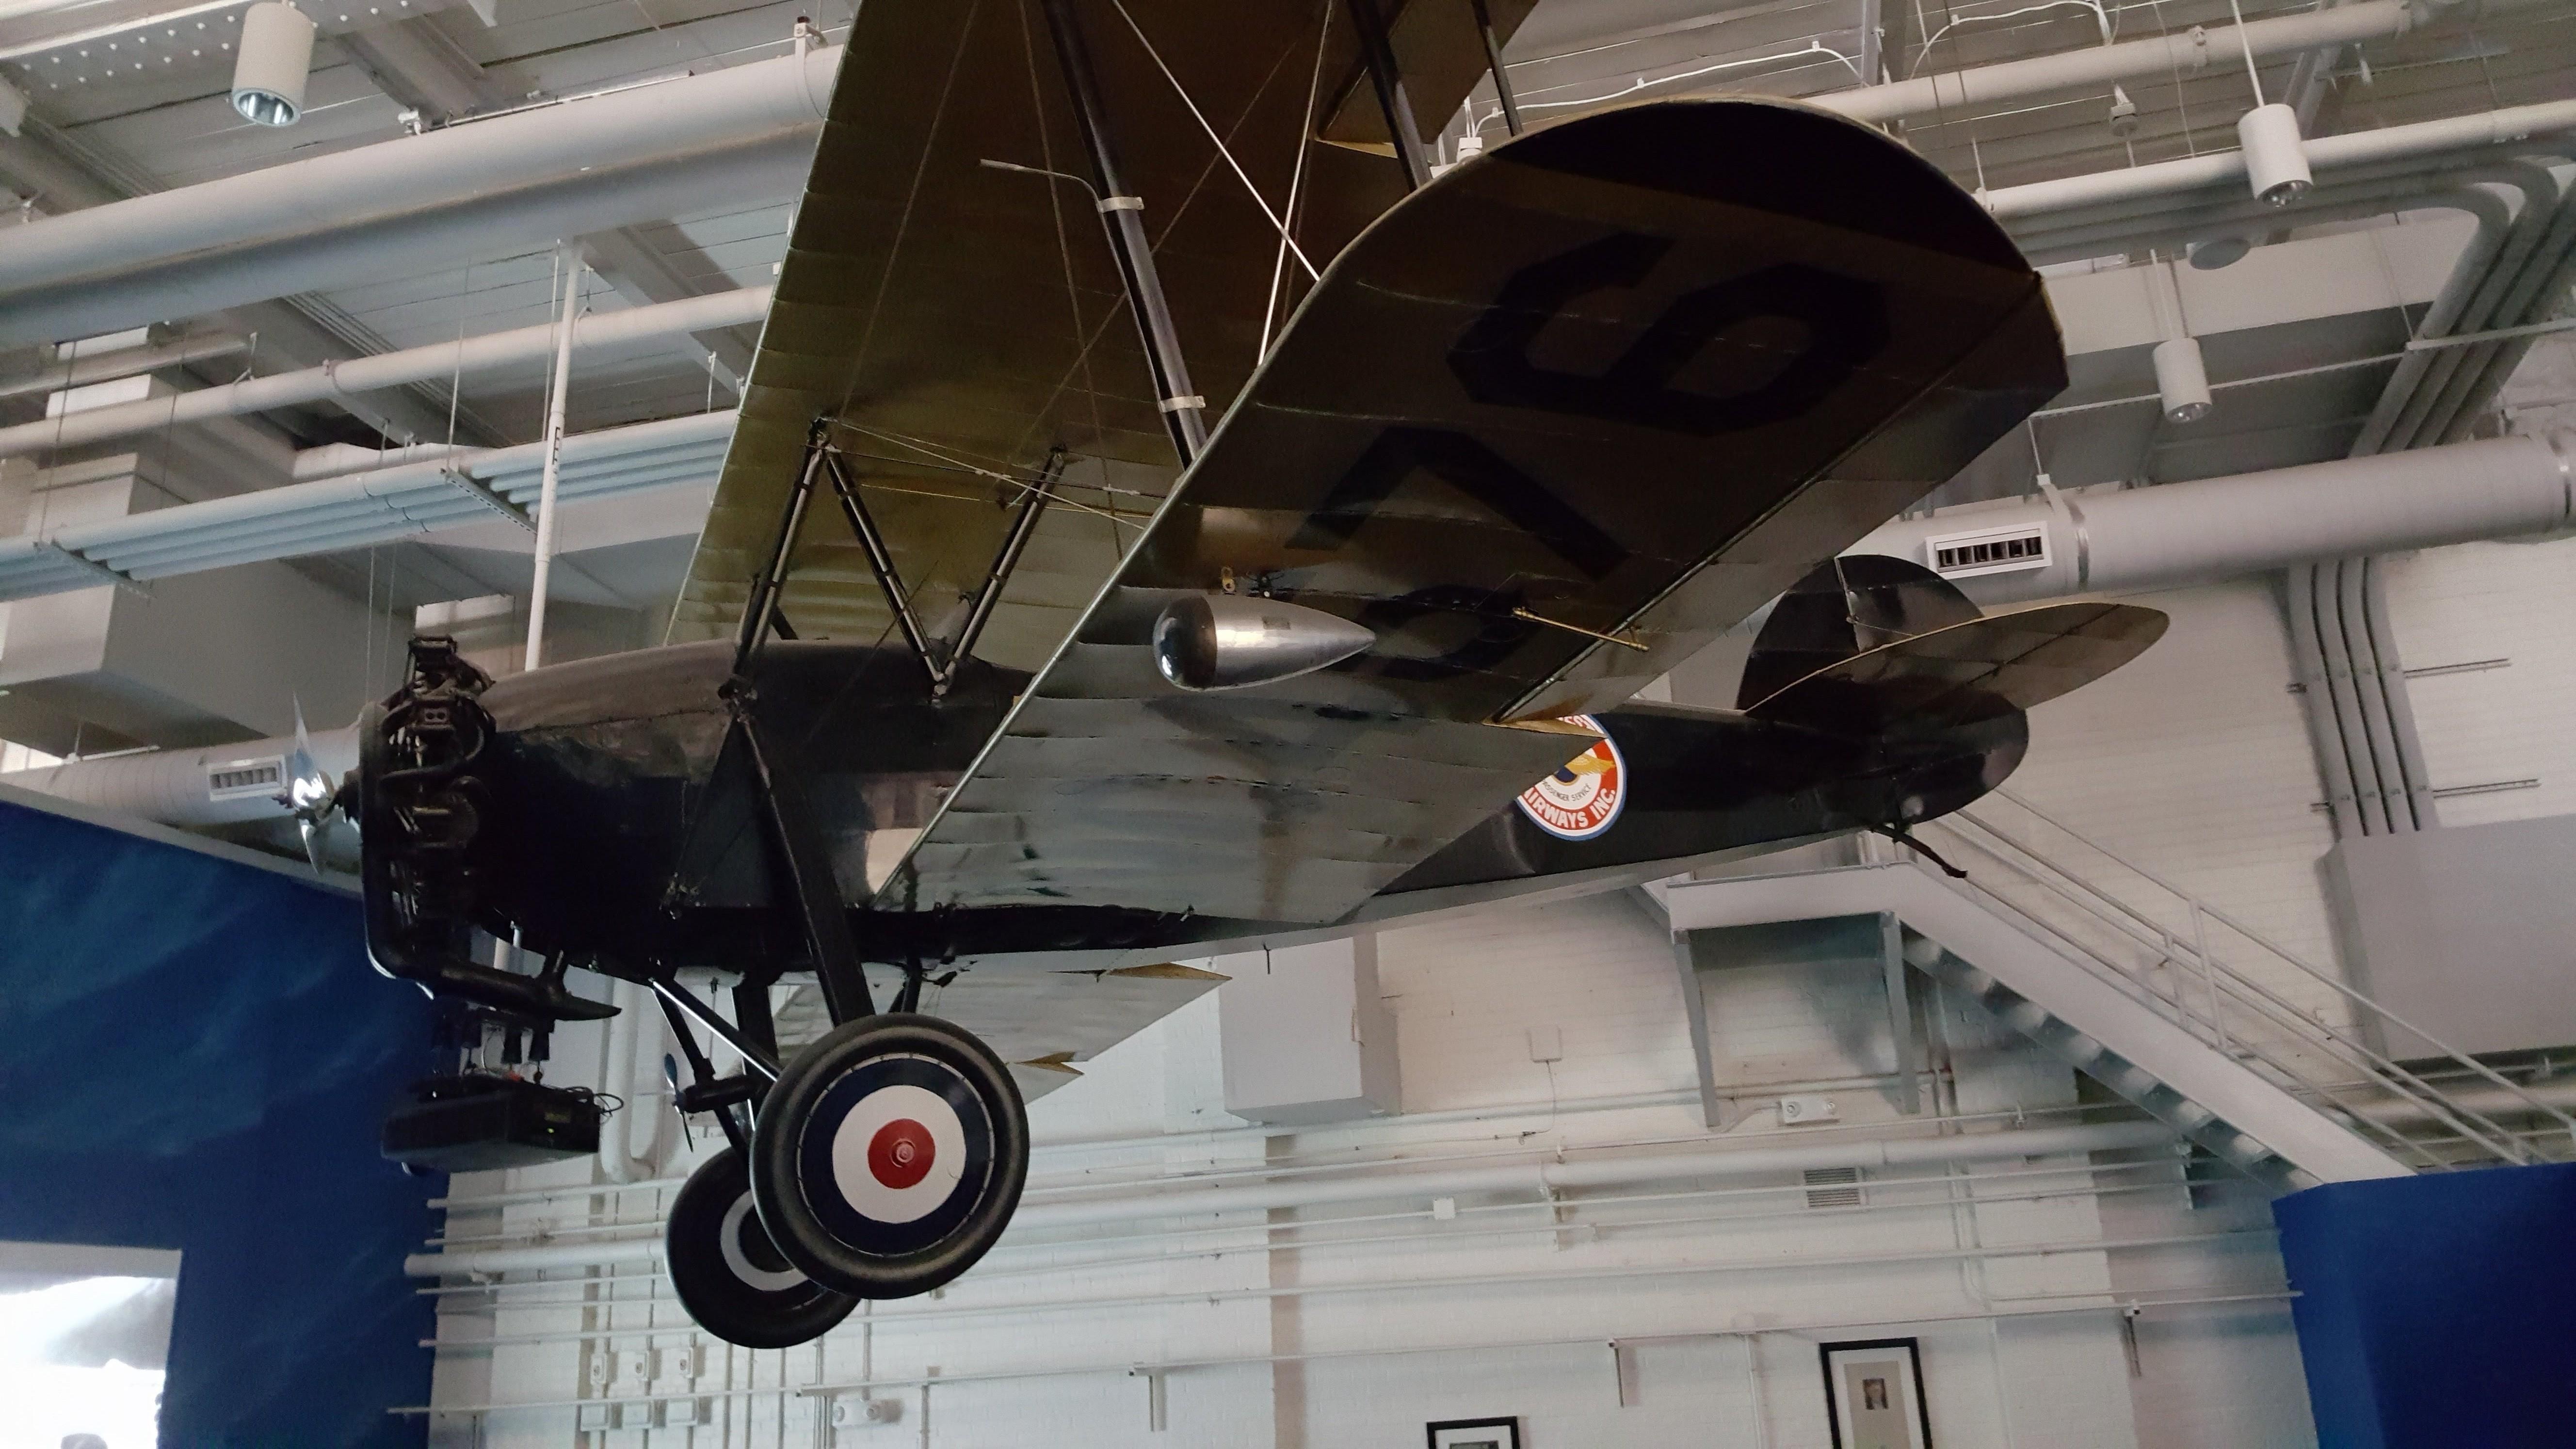 Airplanes at the Delta Flight Museum at the Hartsfield–Jackson Atlanta International Airport.